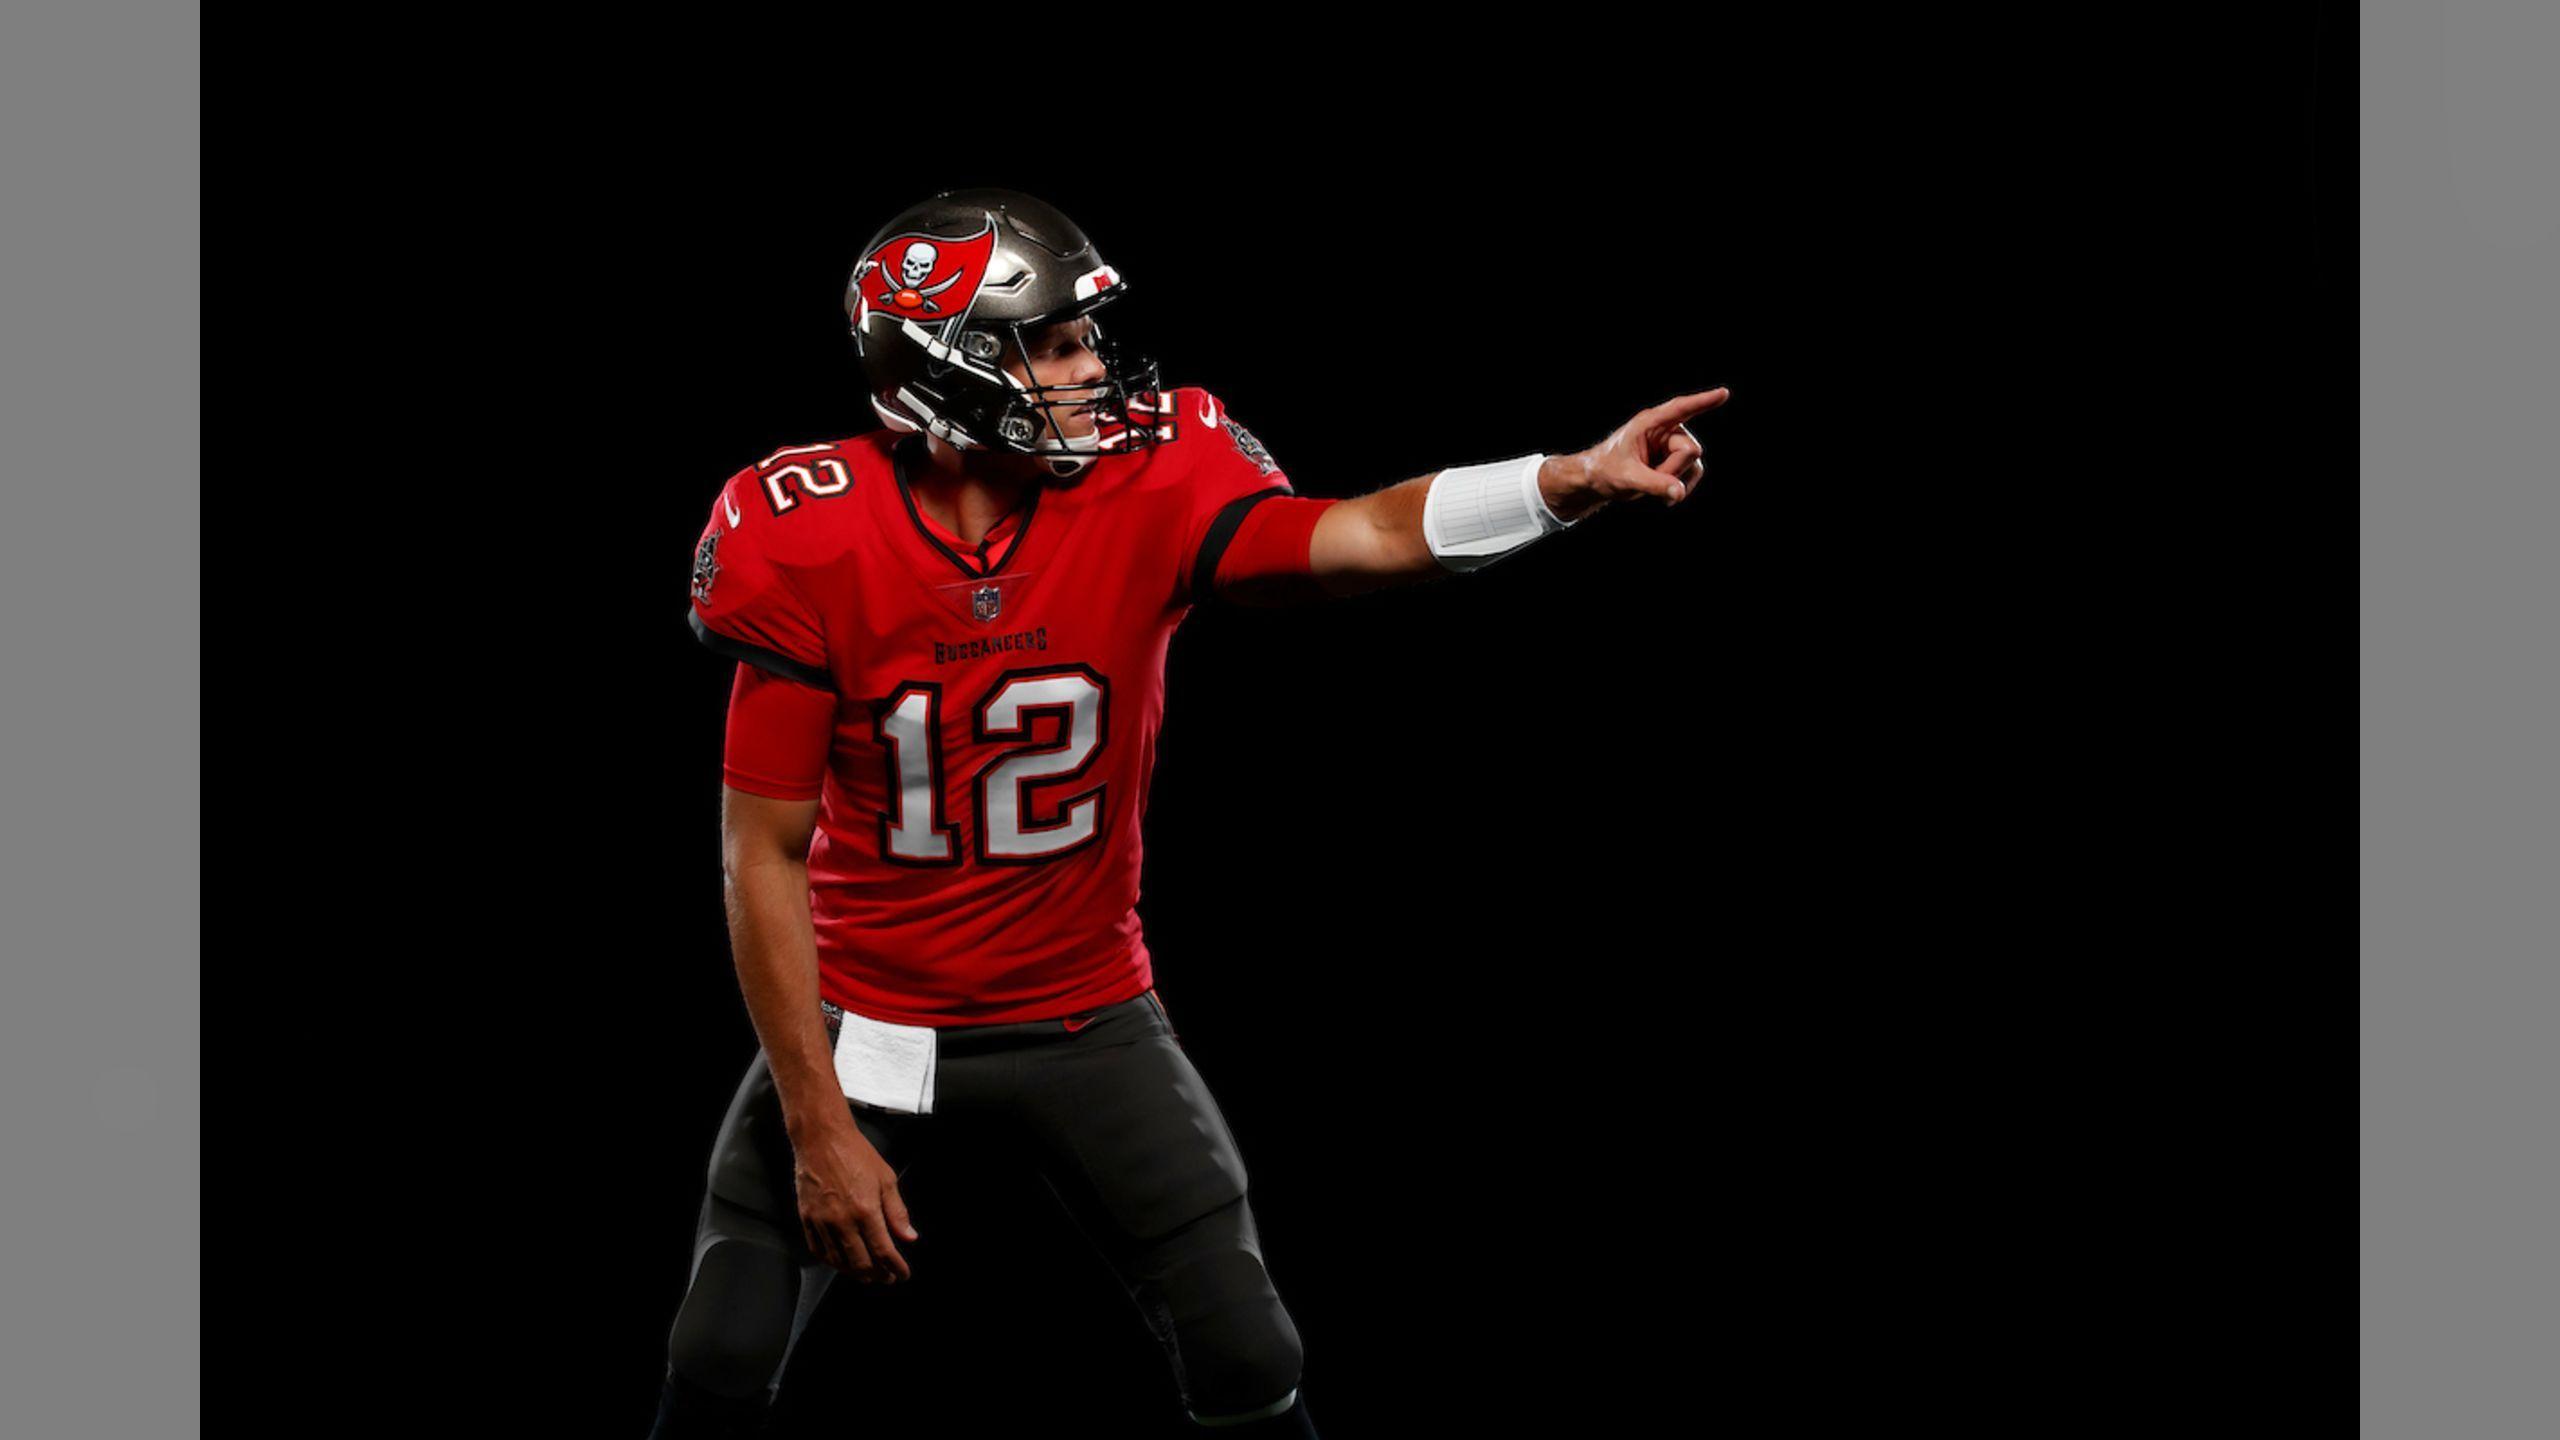 Photos First Look At Tom Brady In A Bucs Uniform Tom Brady Buccaneers Football Tom Brady News